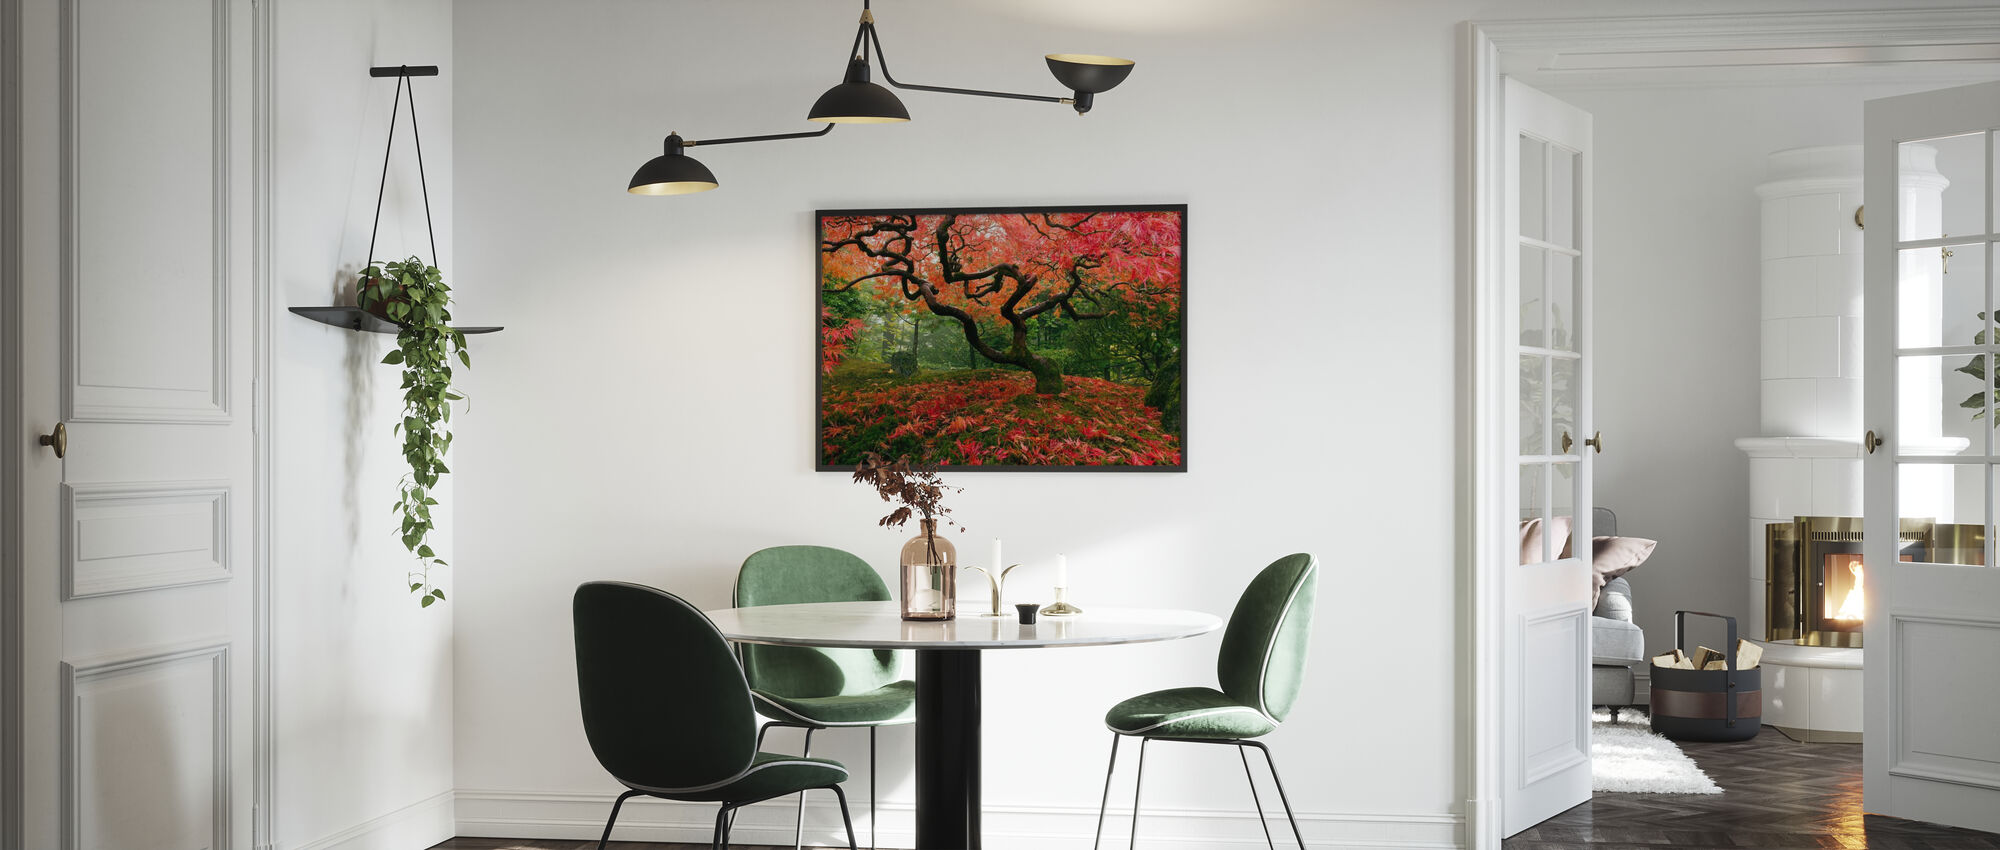 Japansk lönnträd - Inramad tavla - Kök